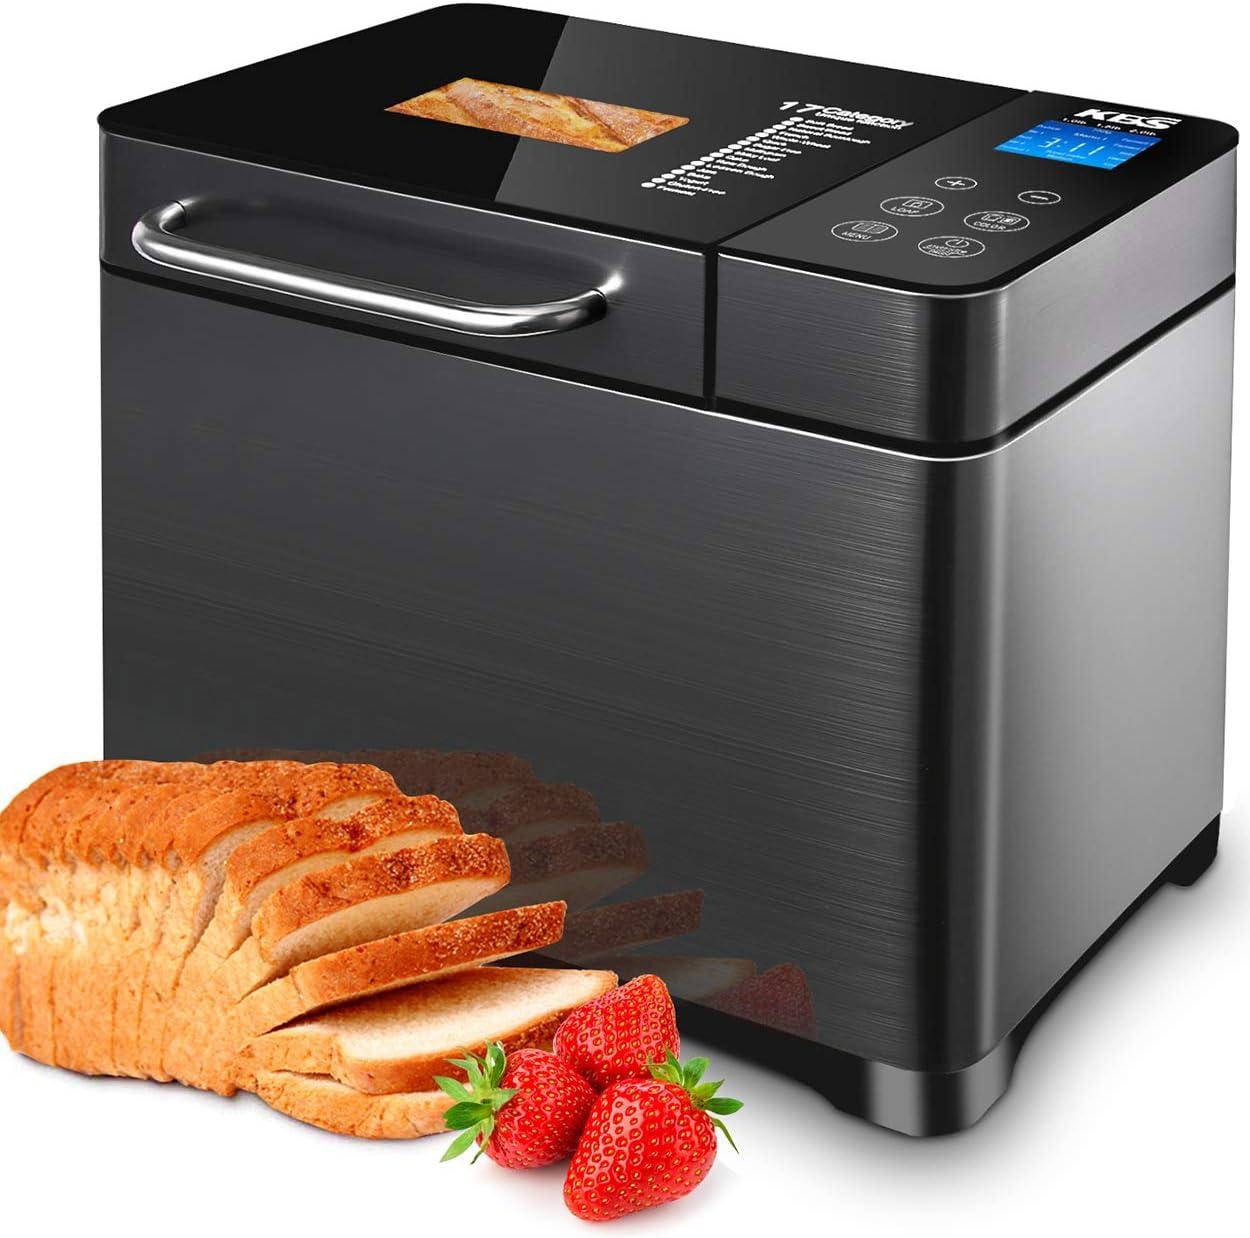 KBS 17-in-1 Bread Maker Machine Dual Heaters 710W with Minneapolis Mall Philadelphia Mall Ma